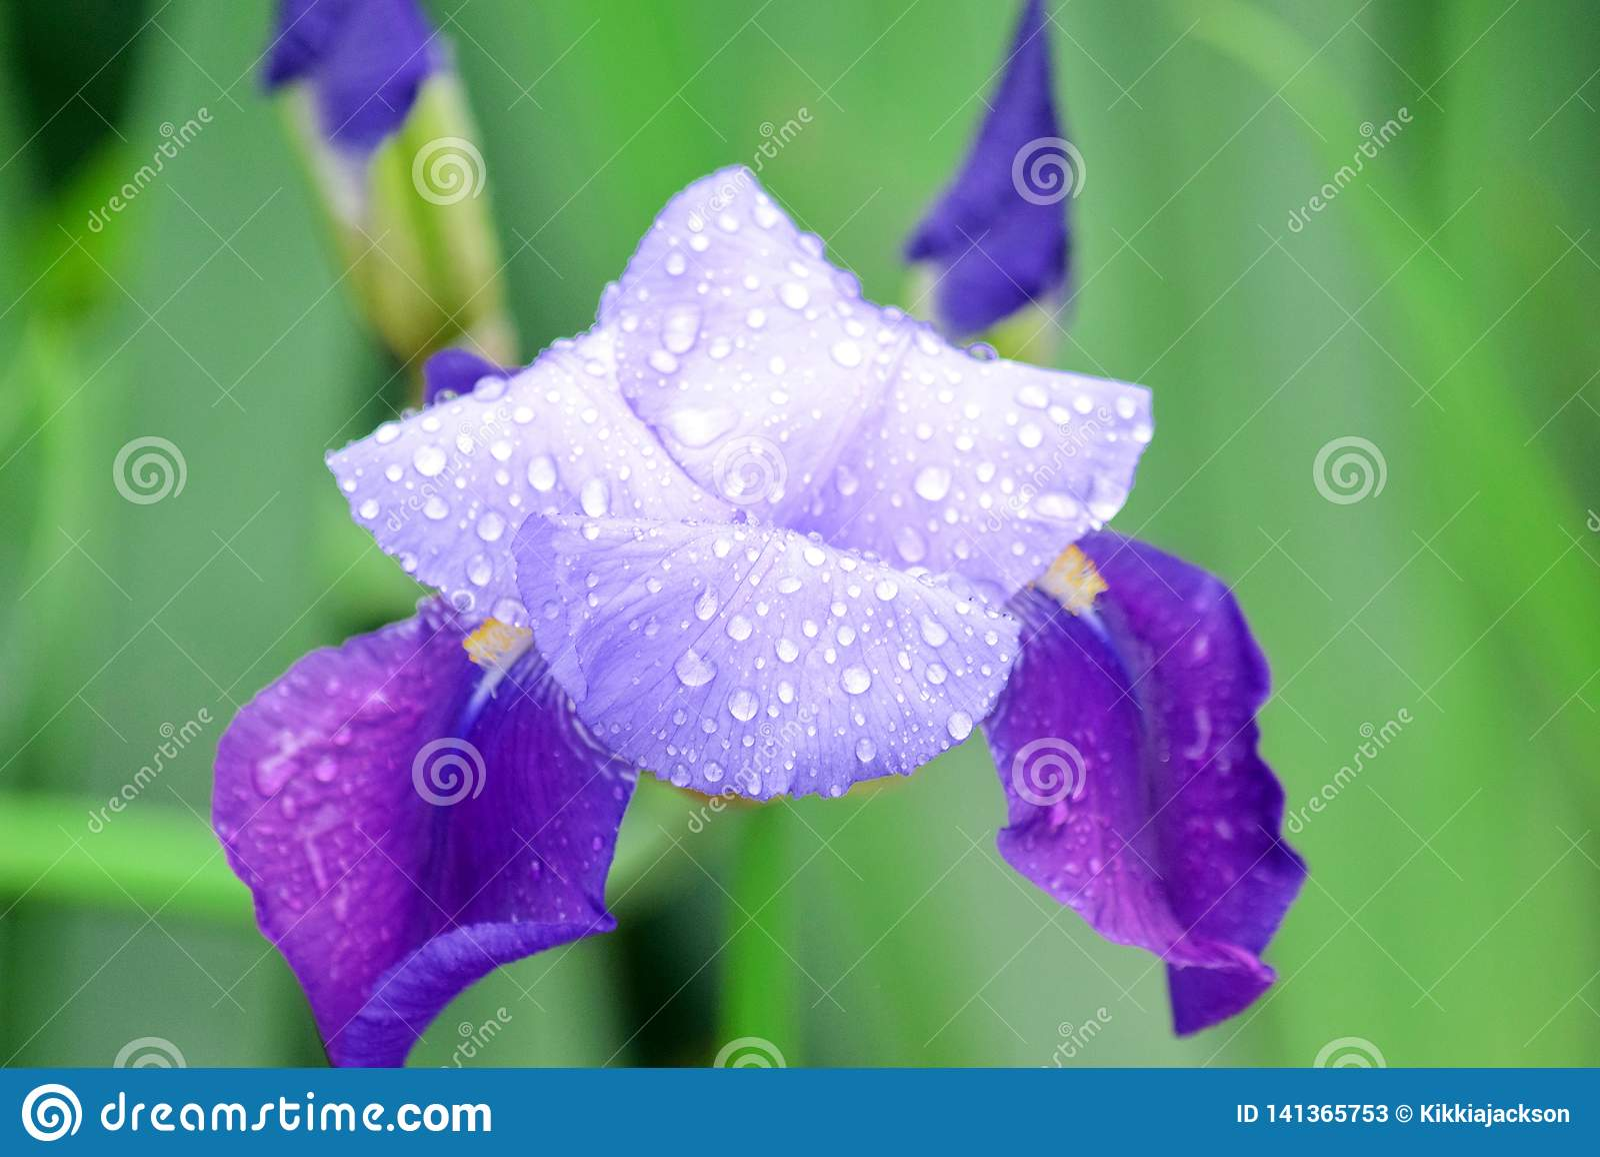 Iris Violet Flowers Home Garden Stock Pfoto Detail Closeup